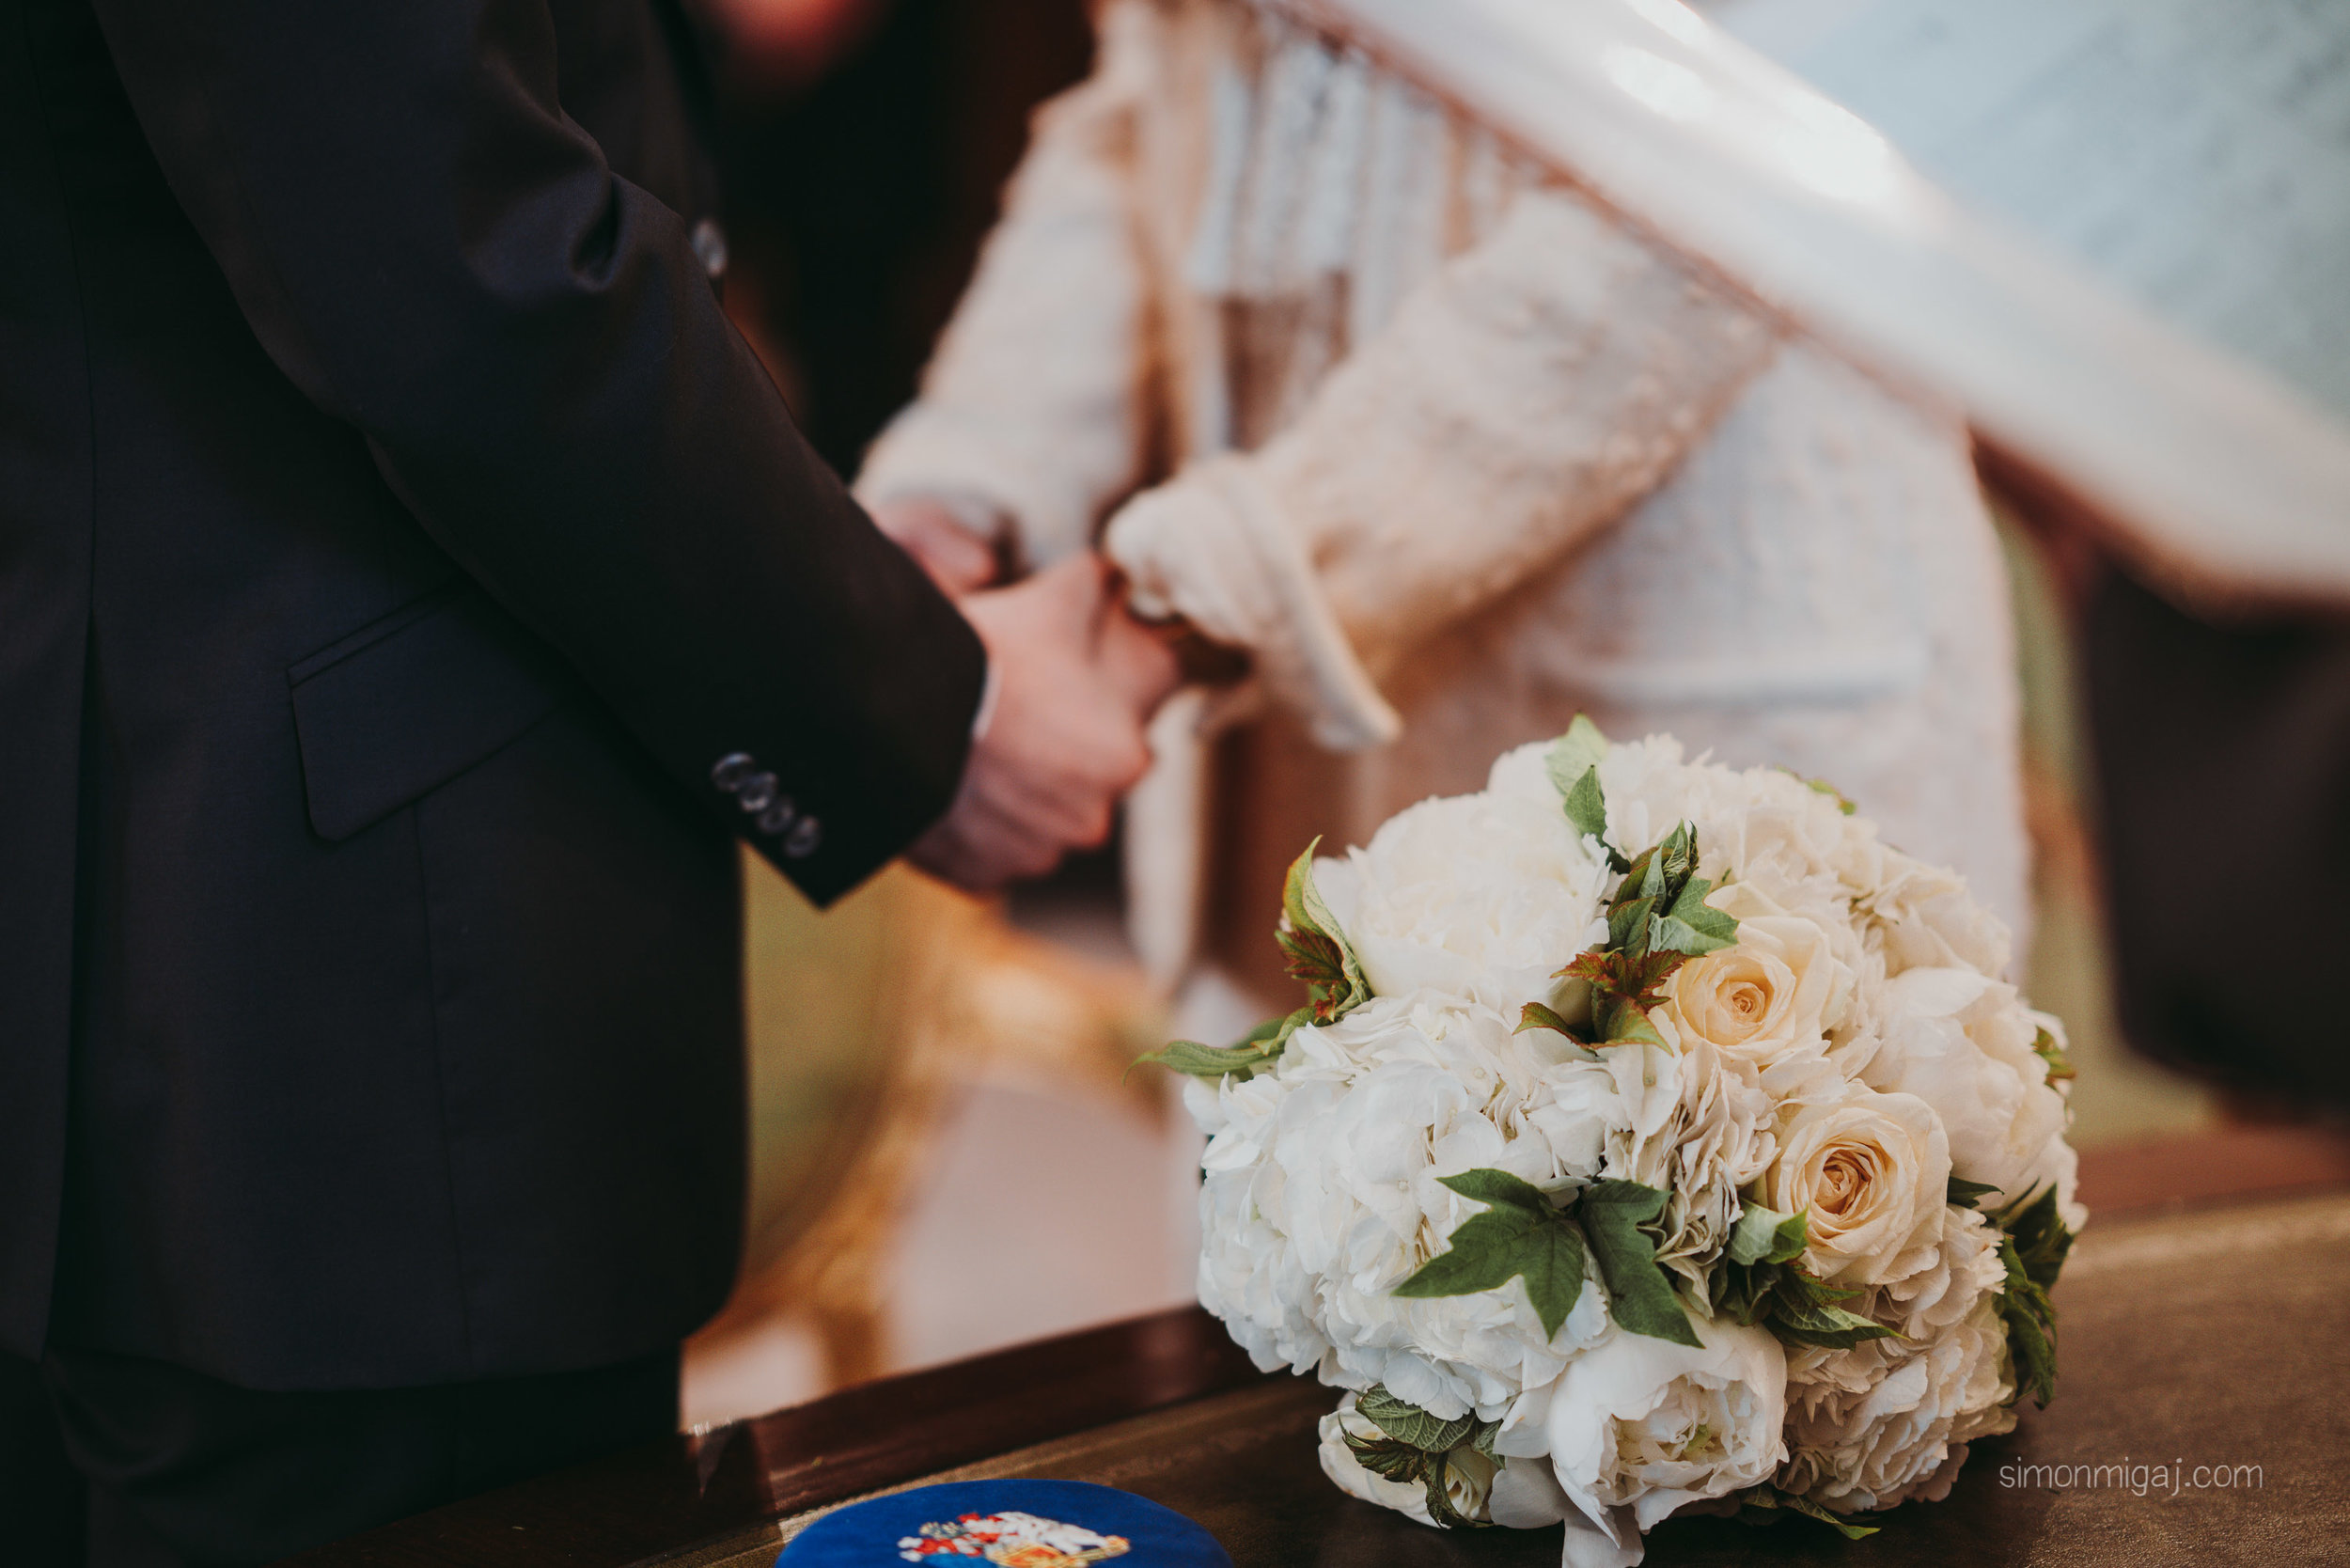 WeddingPhotography_AgathaStavros-4.jpg